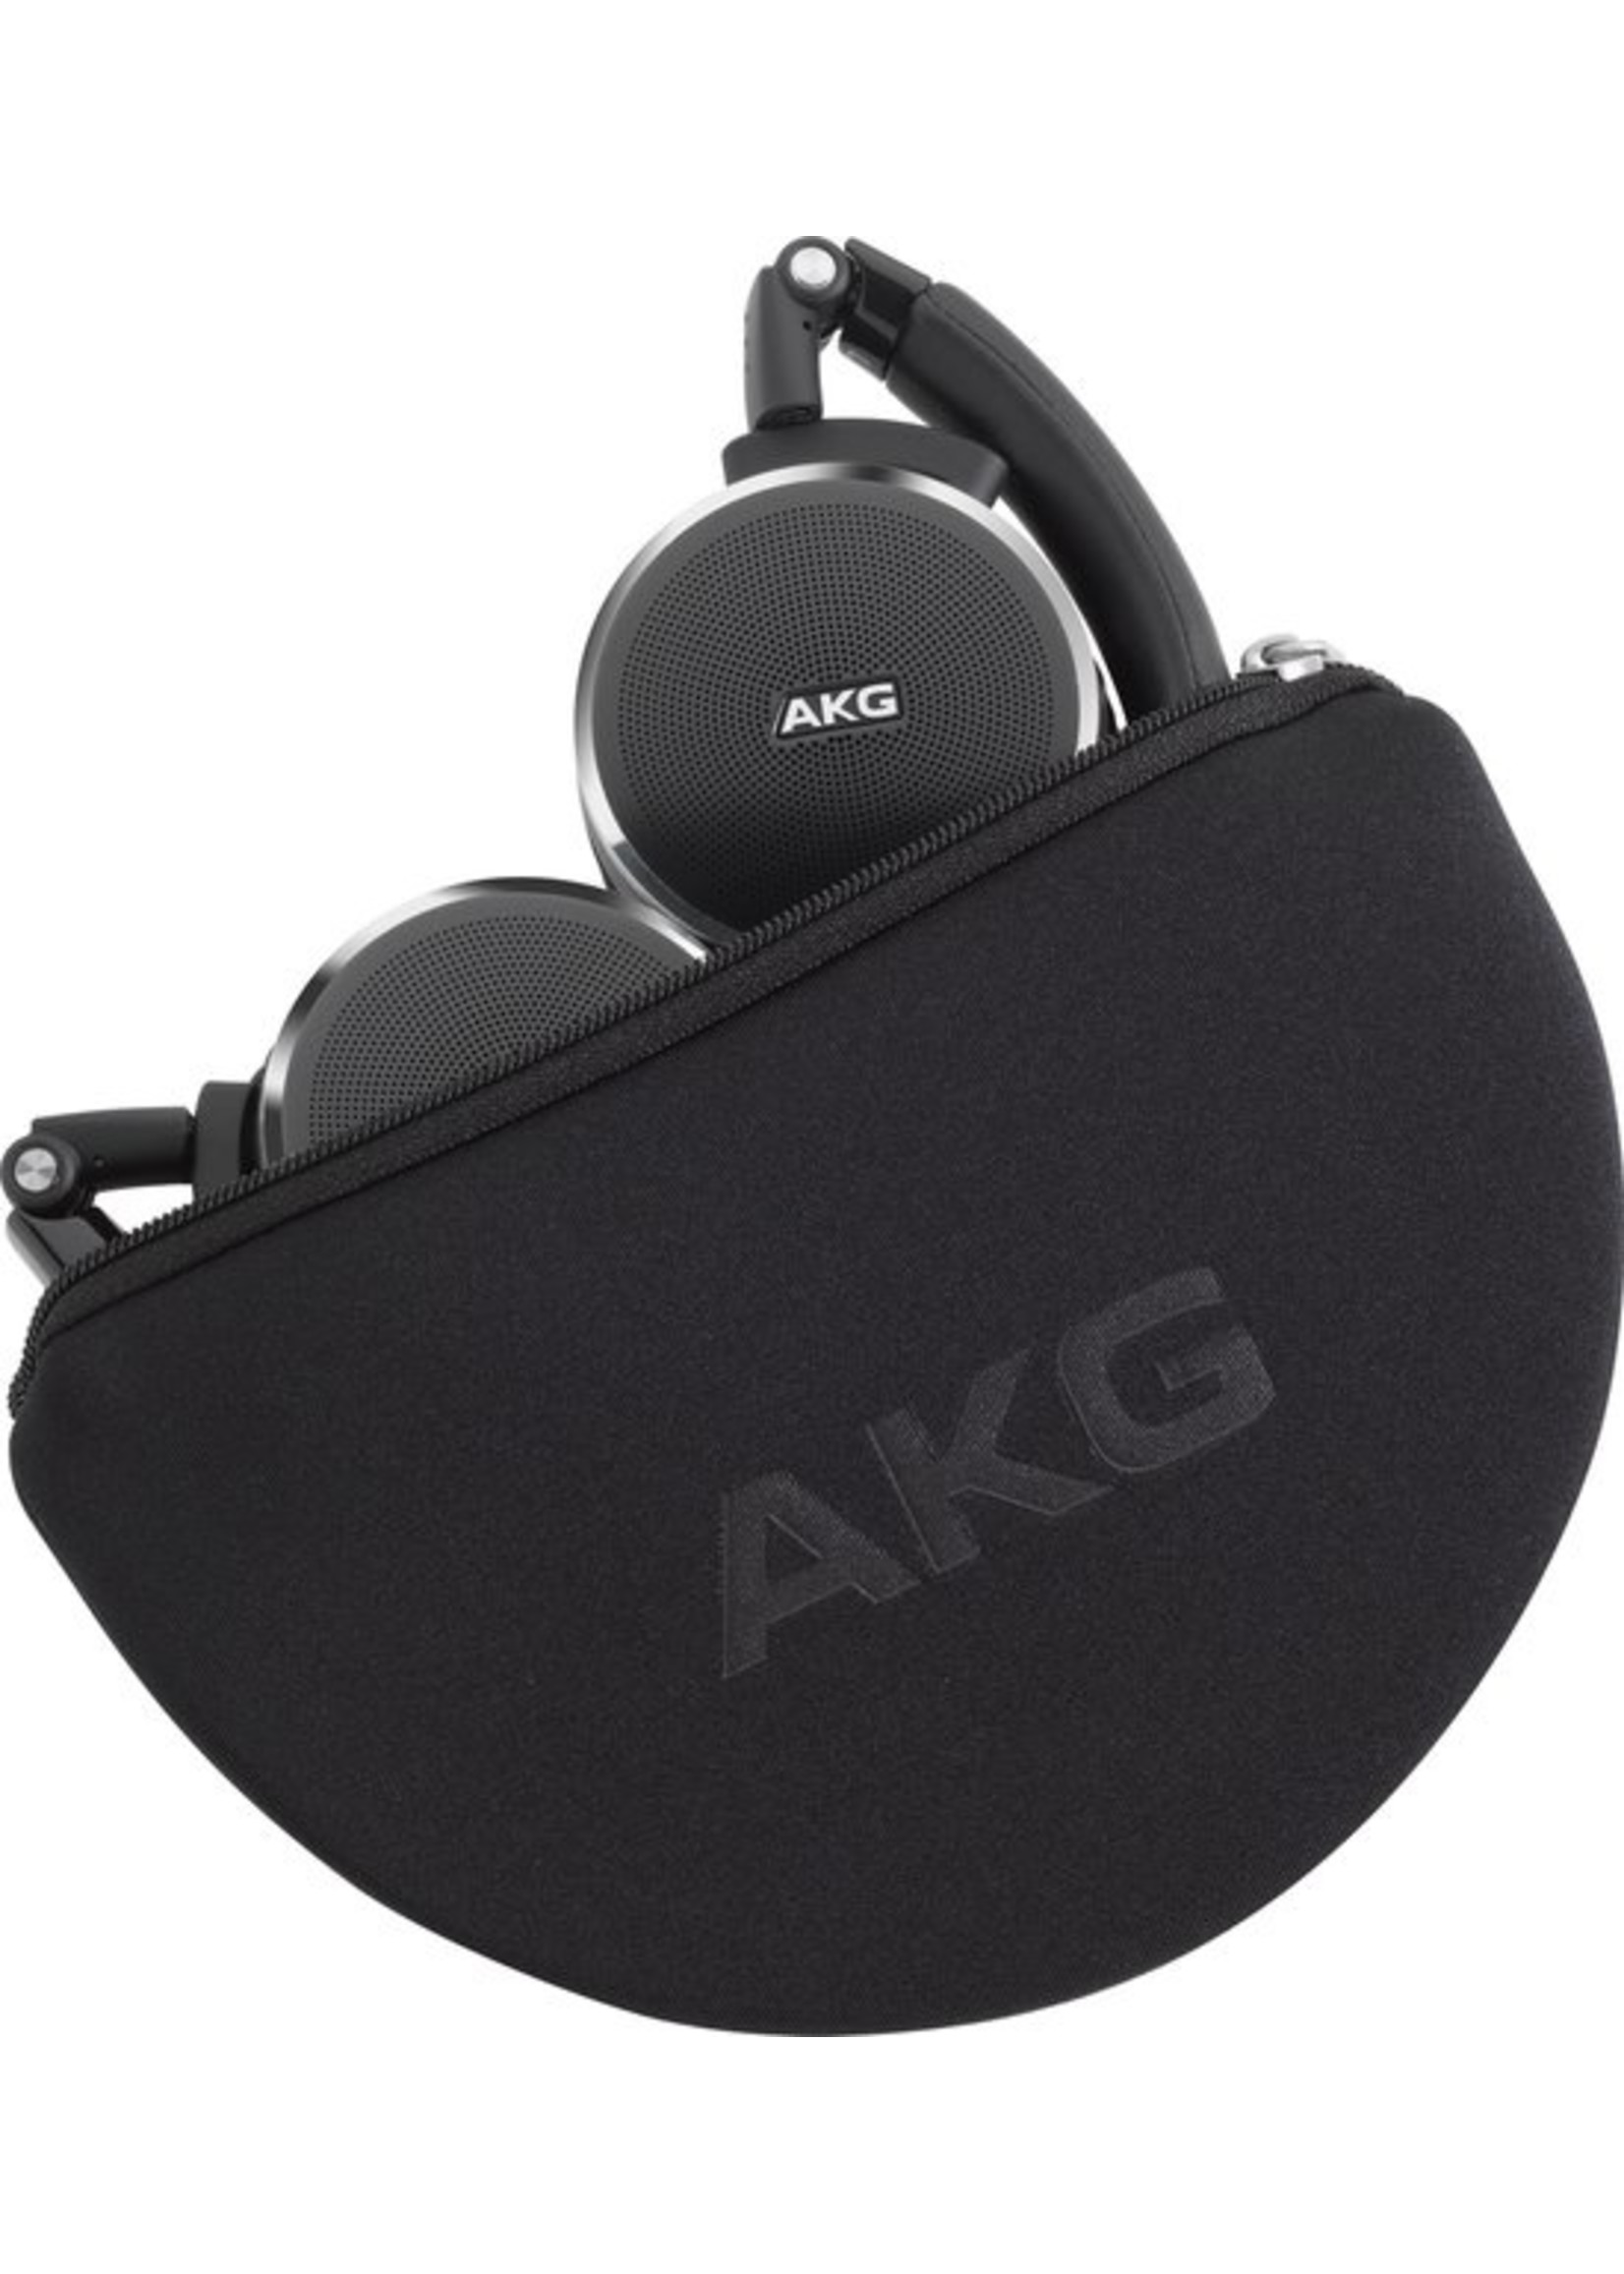 AKG AKG N60NC - BT - On-Ear ANC Noise Cancelling Wireless Headphone - Zwart